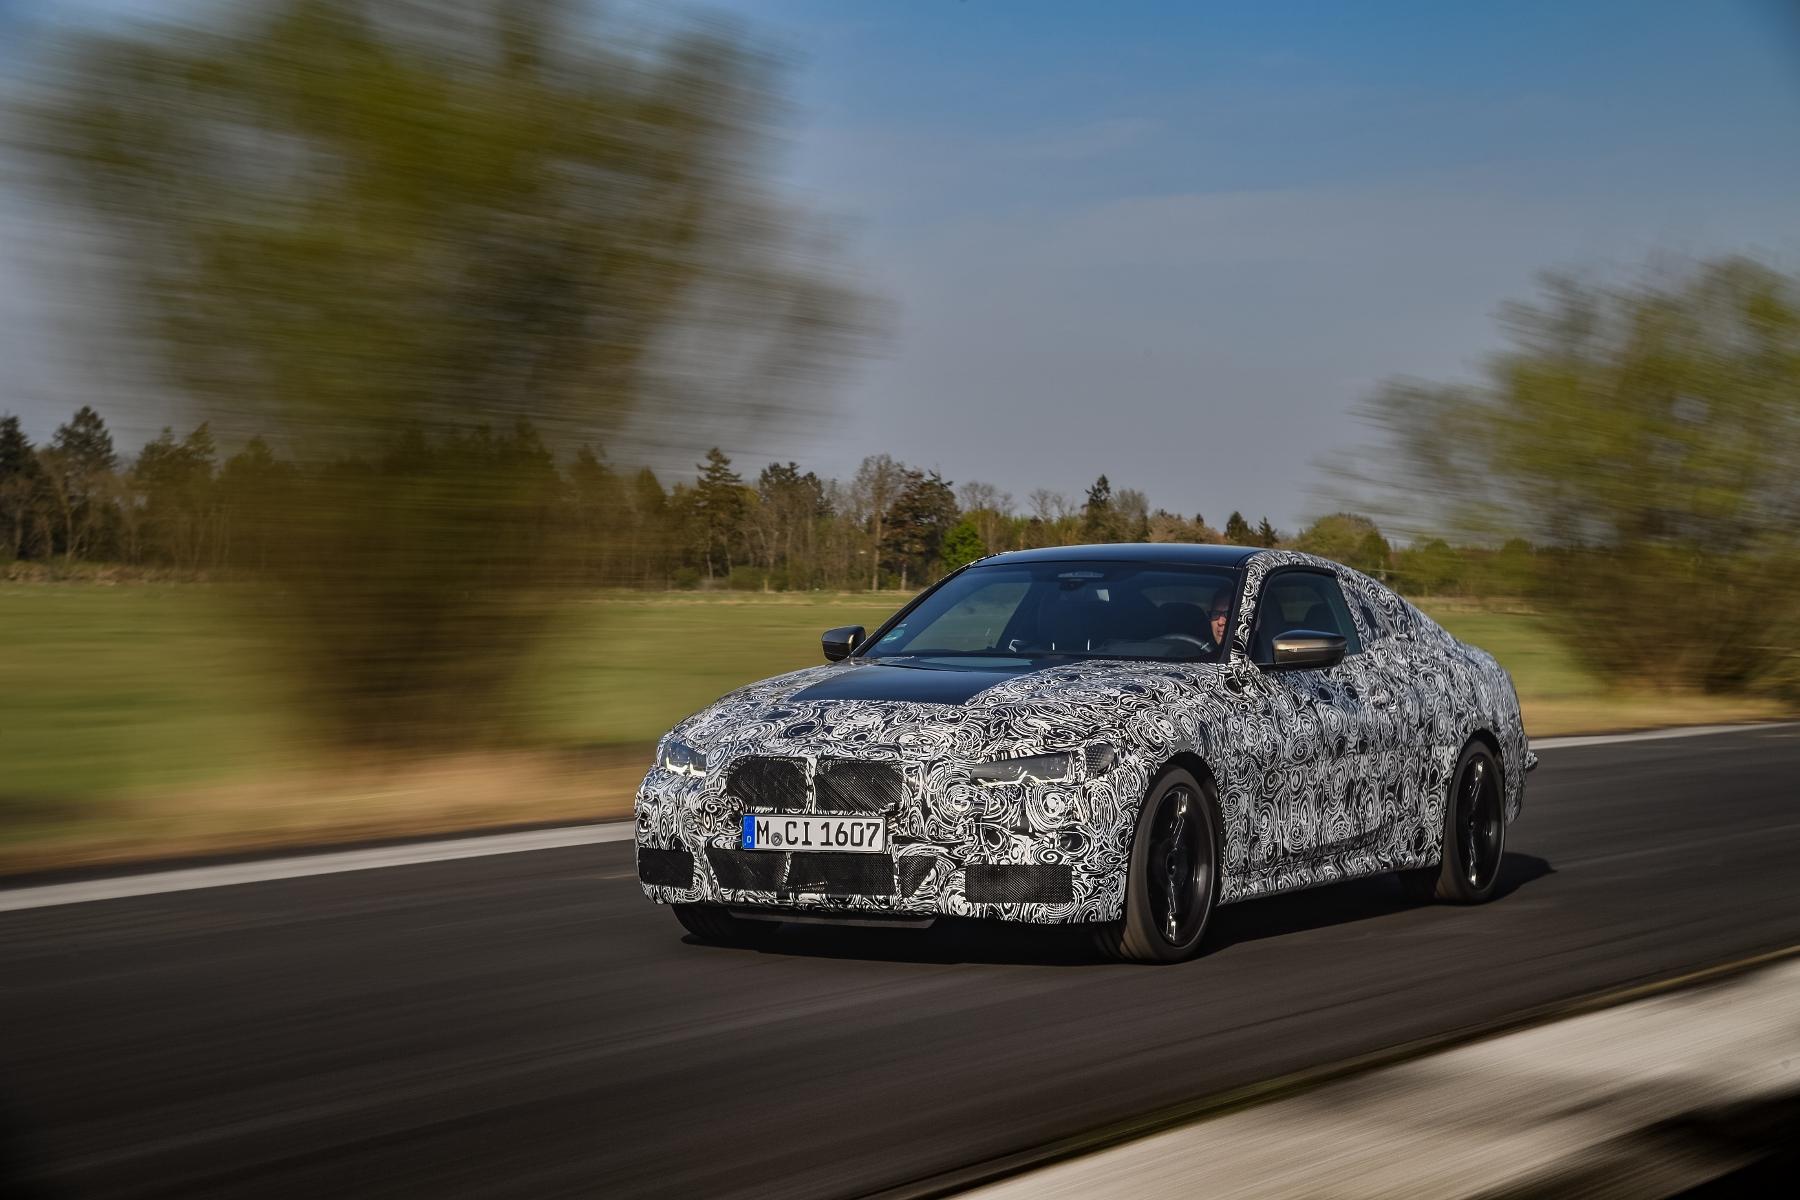 Nové BMW radu 4 Coupé dostane športovejší podvozok UAyDAukcKH bmw-4-coupe-6